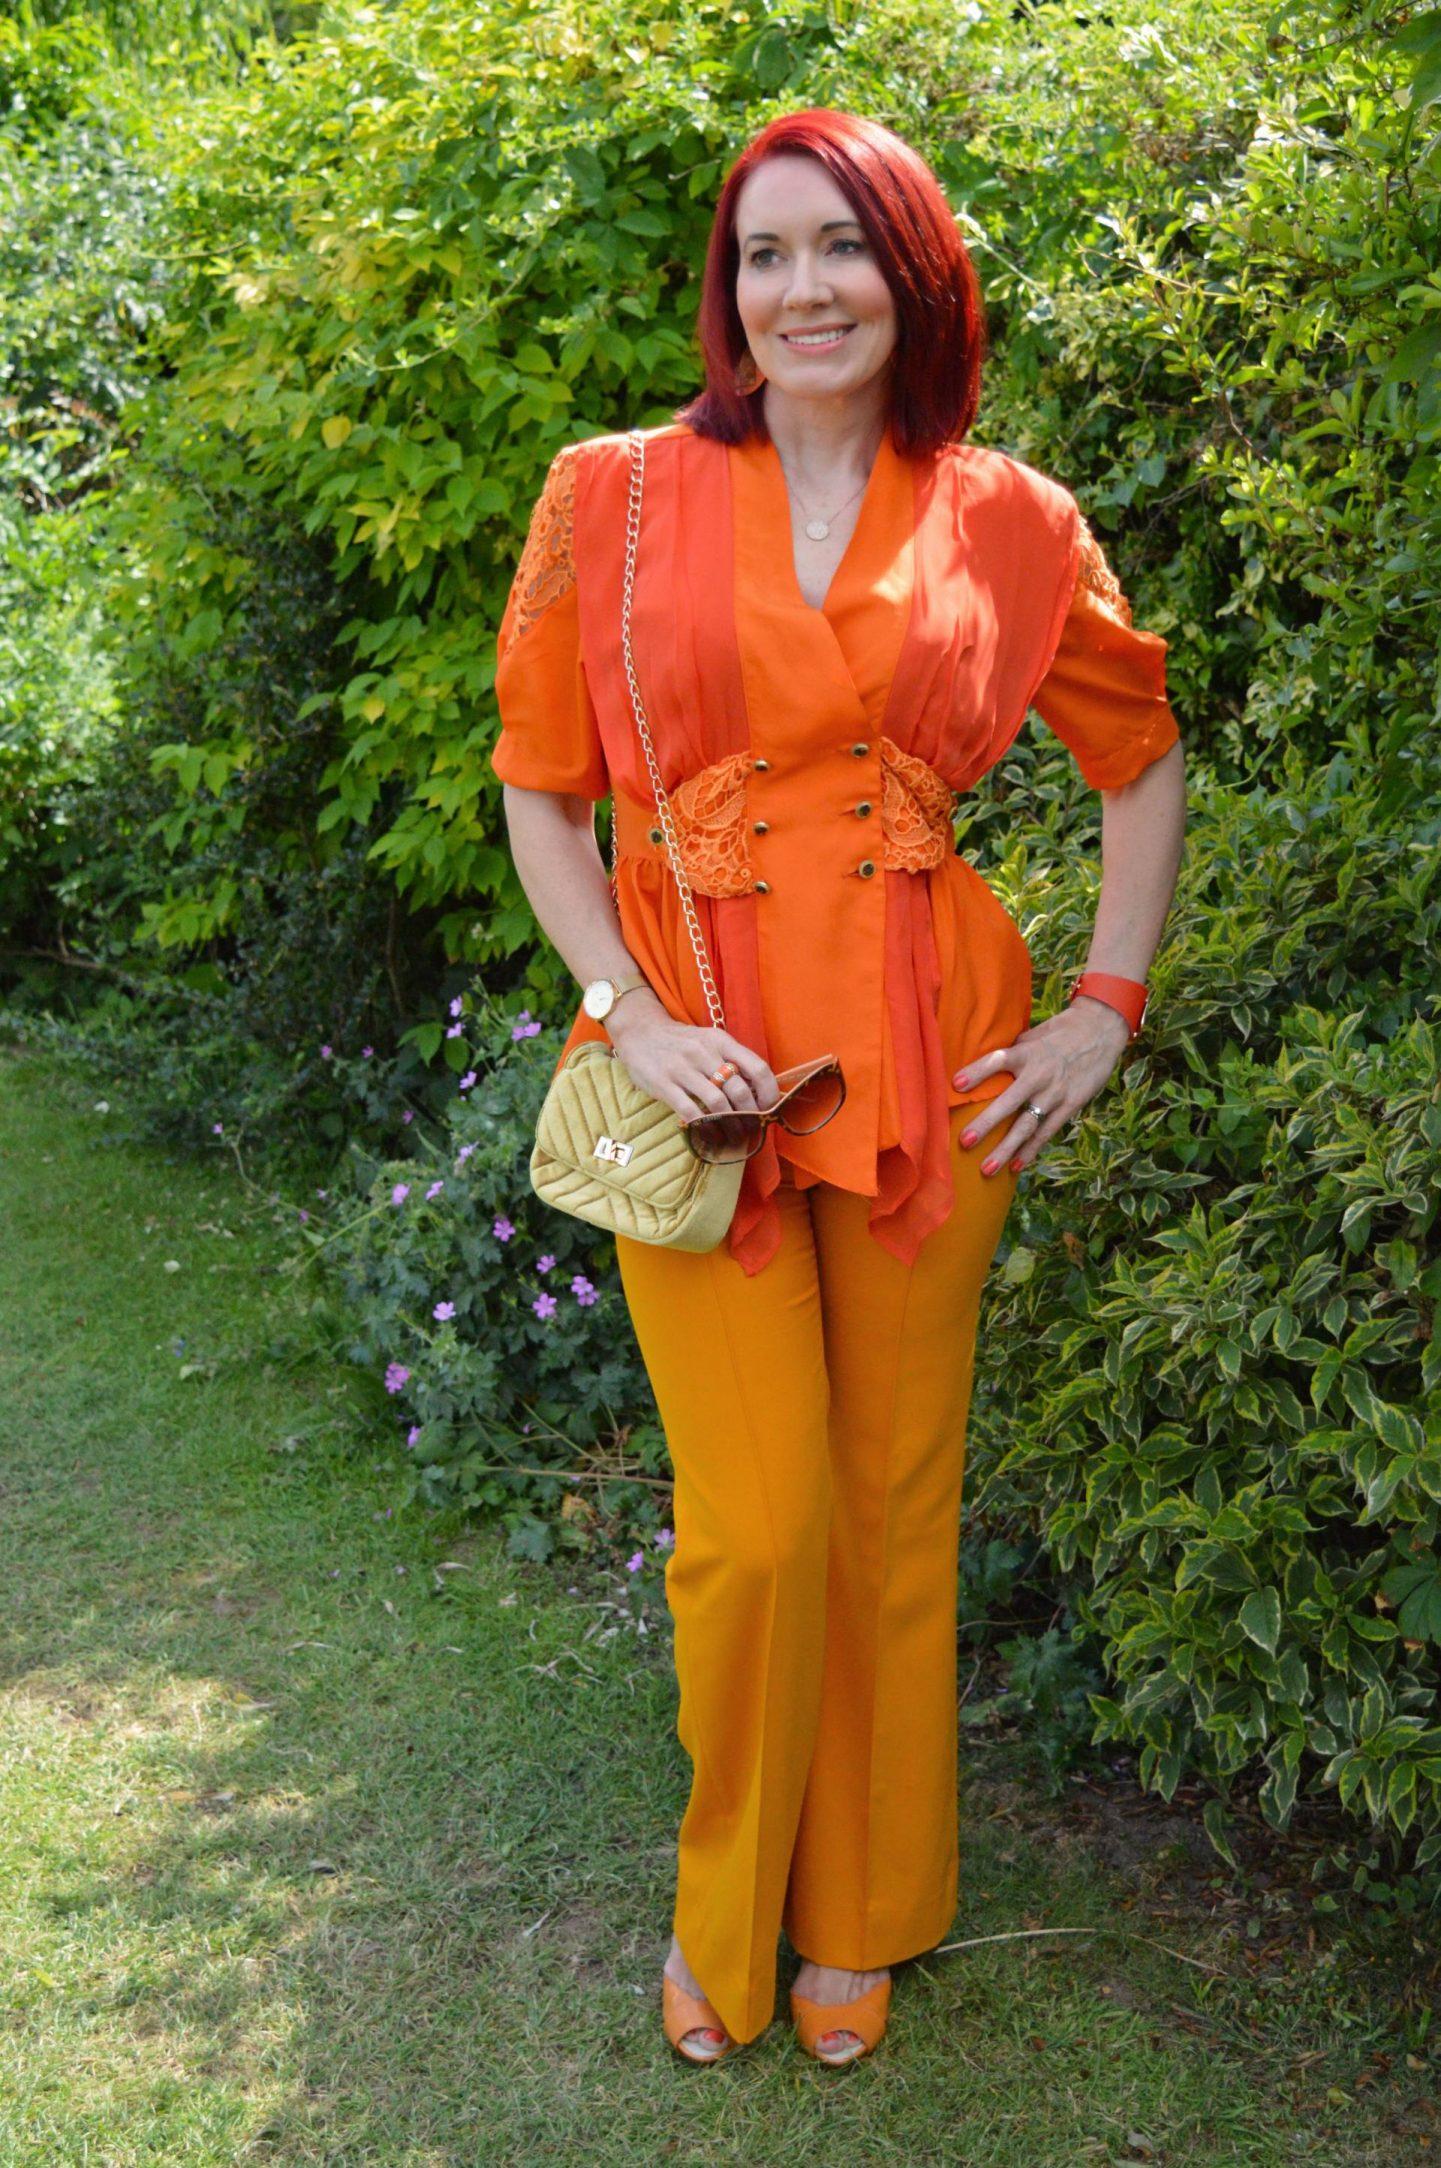 I've Got My Orange Crush + Style With a Style Link Up, vintage orange blouse, Zara marigold orange trousers, Miss Sixty orange sandals